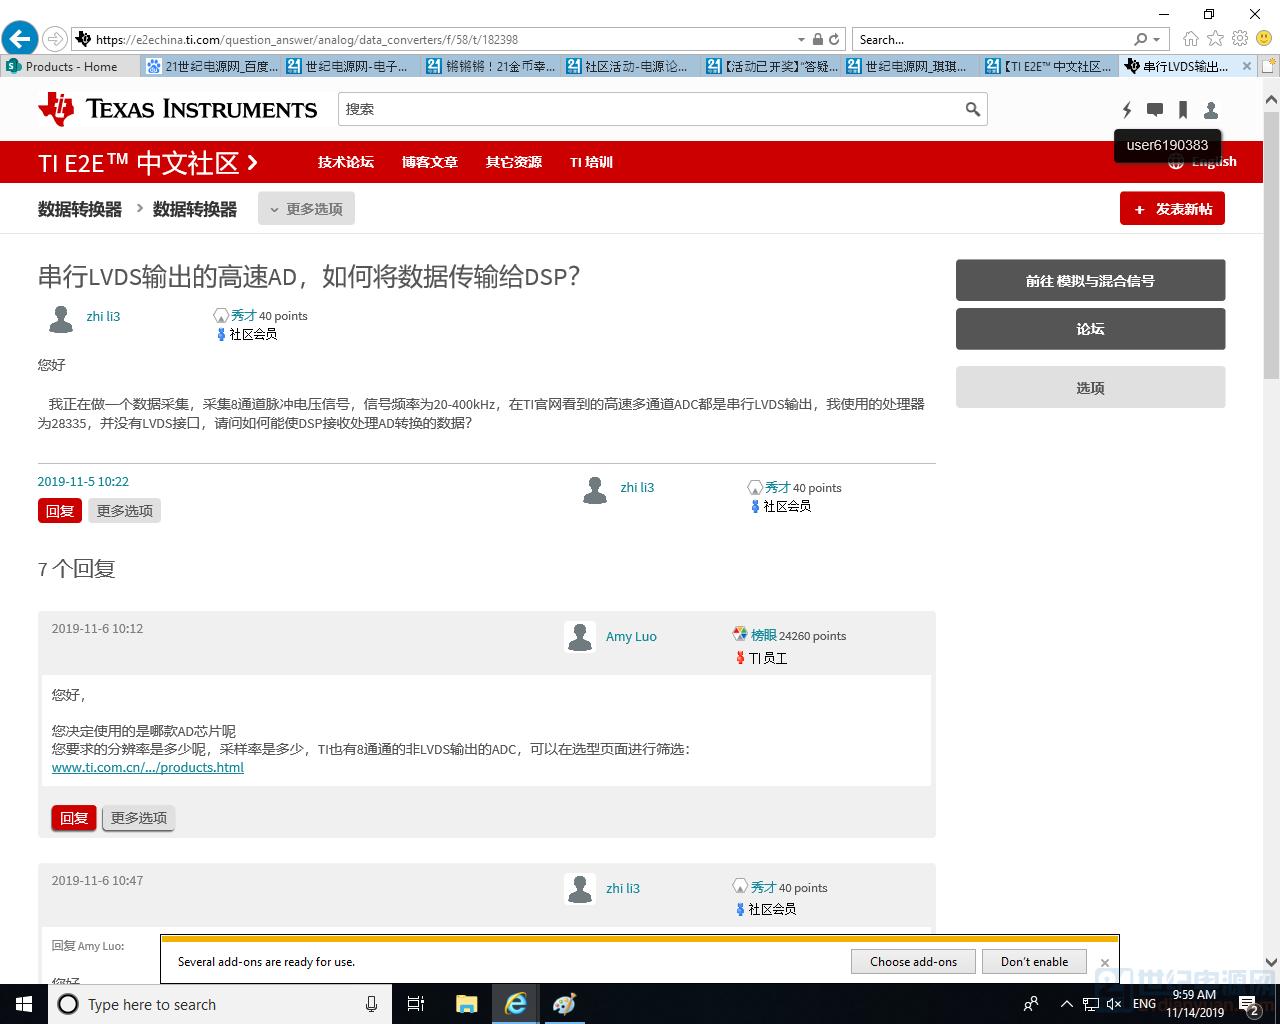 BAC26624-D5B3-40B1-9526-FD61EDD09A4C.png